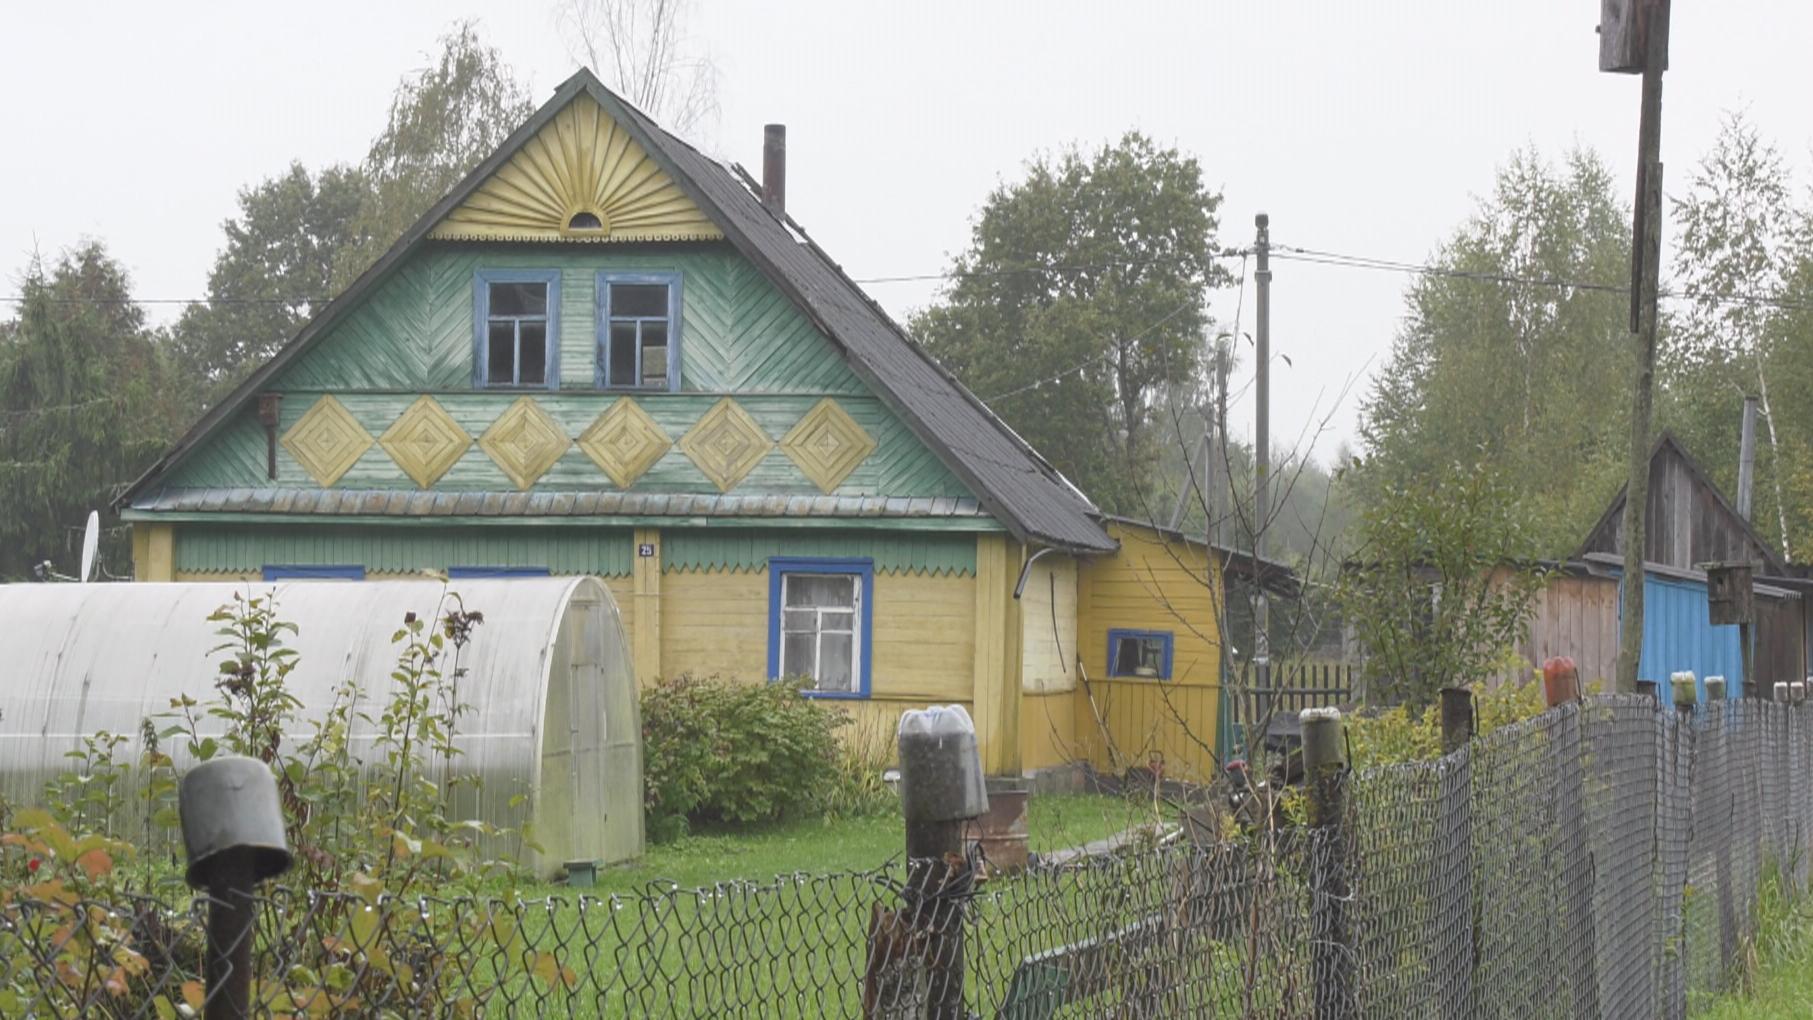 poiski - В Витебском районе ищут пропавшую в лесу пенсионерку (21.09.2021)